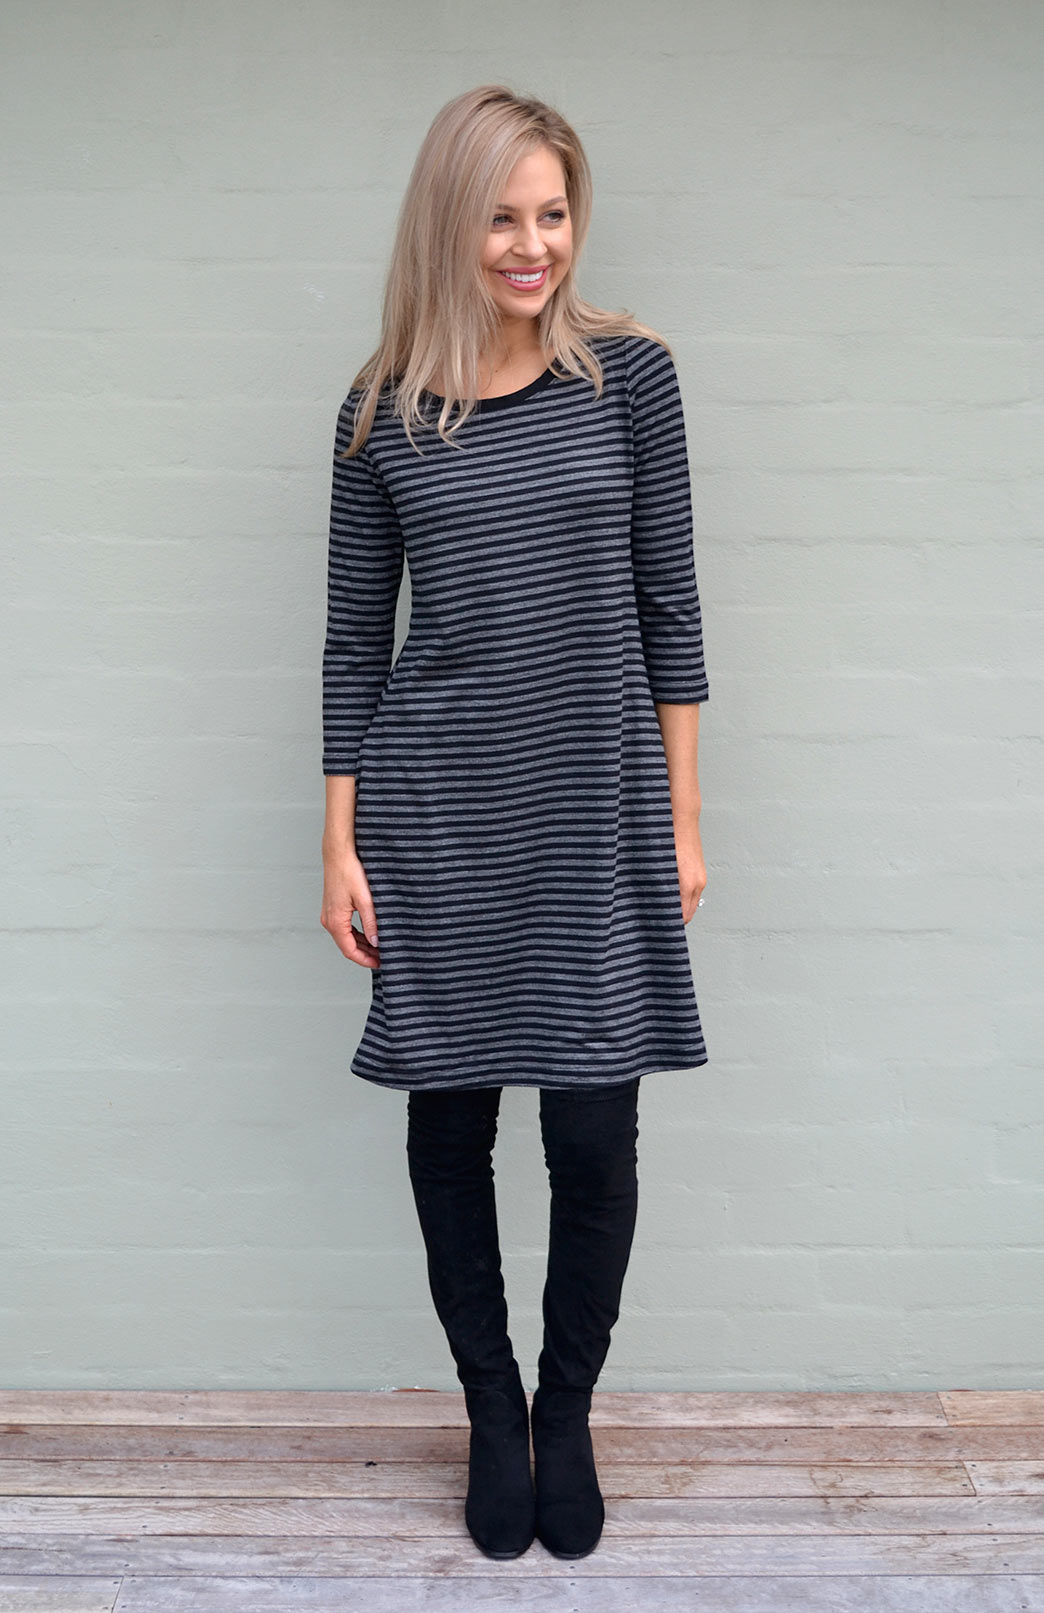 8551-ellie-dress-black-grey-stripe-0.jpg